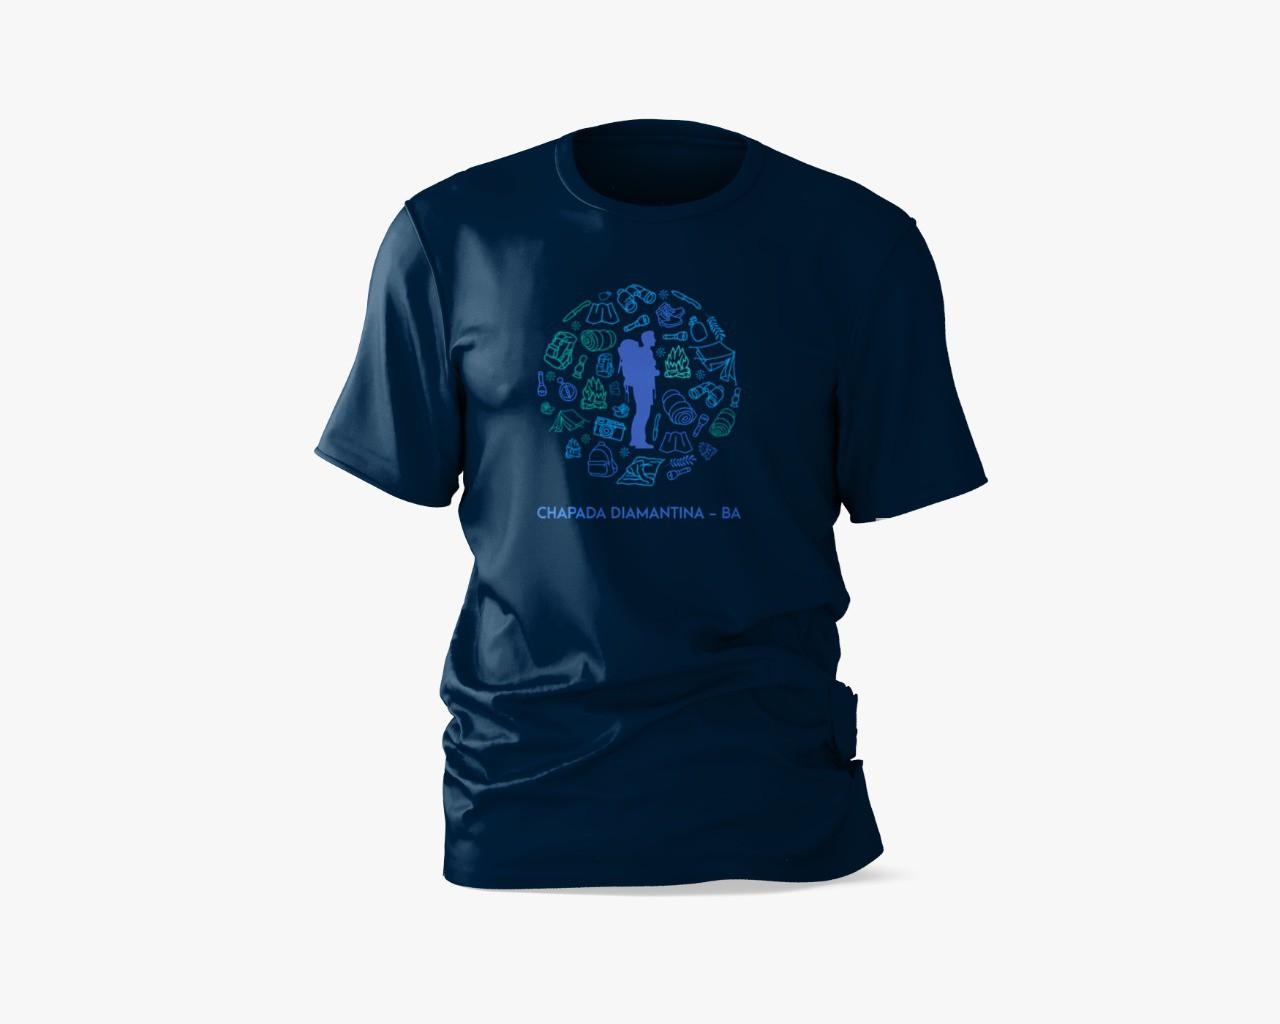 Camisa Chapada Diamantina - Andarilho